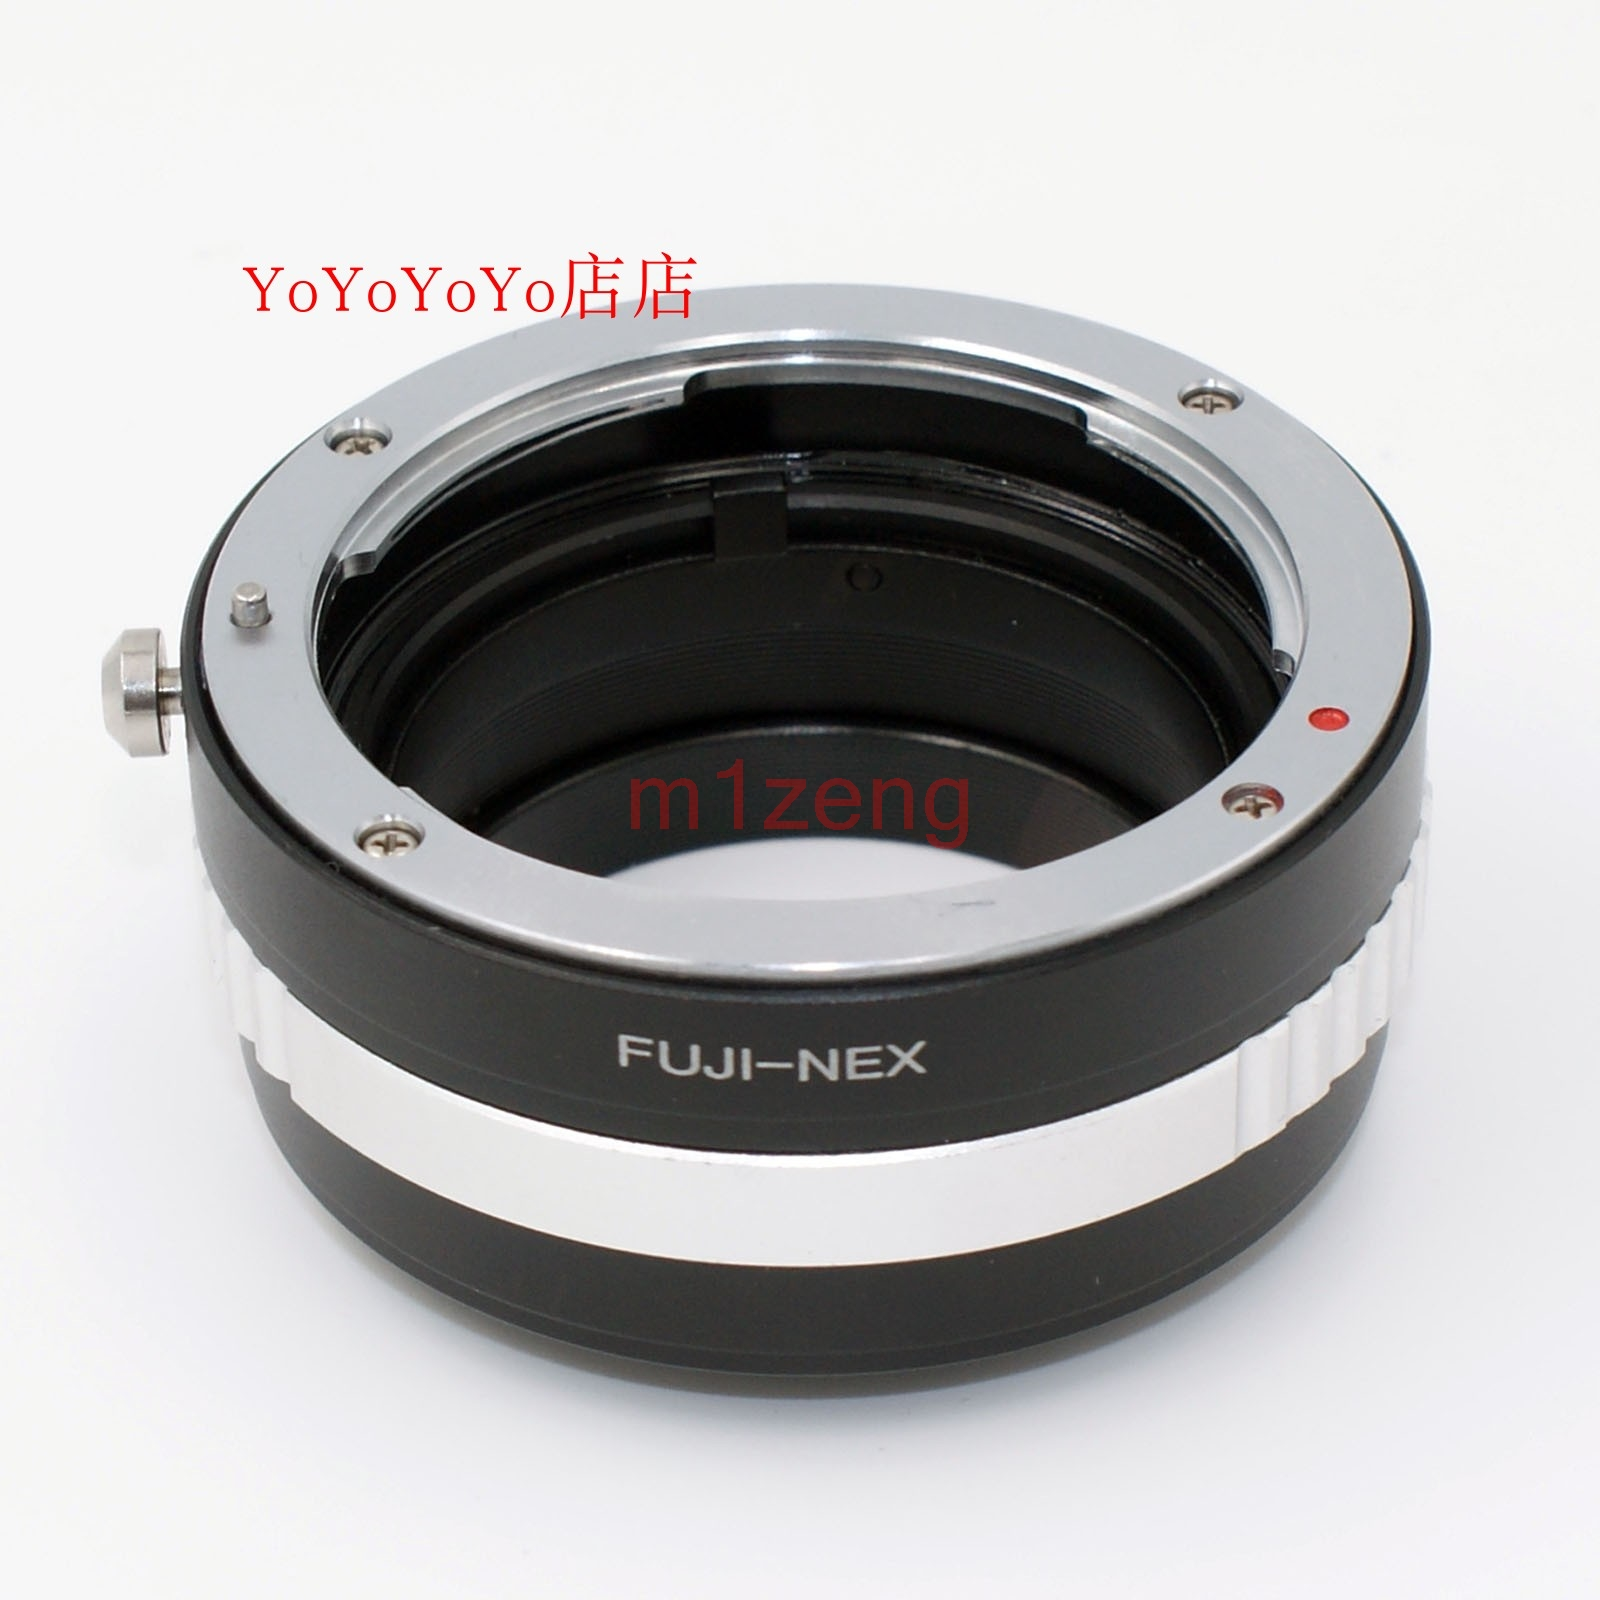 Переходное кольцо для камеры Fujica X Old Fuji AX mount lens для sony e mount a5100 a6000 a6300 a6500 NEX3/5N/7/6 a7 a9 a7r a7s a7r3|Адаптеры для объектива|   | АлиЭкспресс